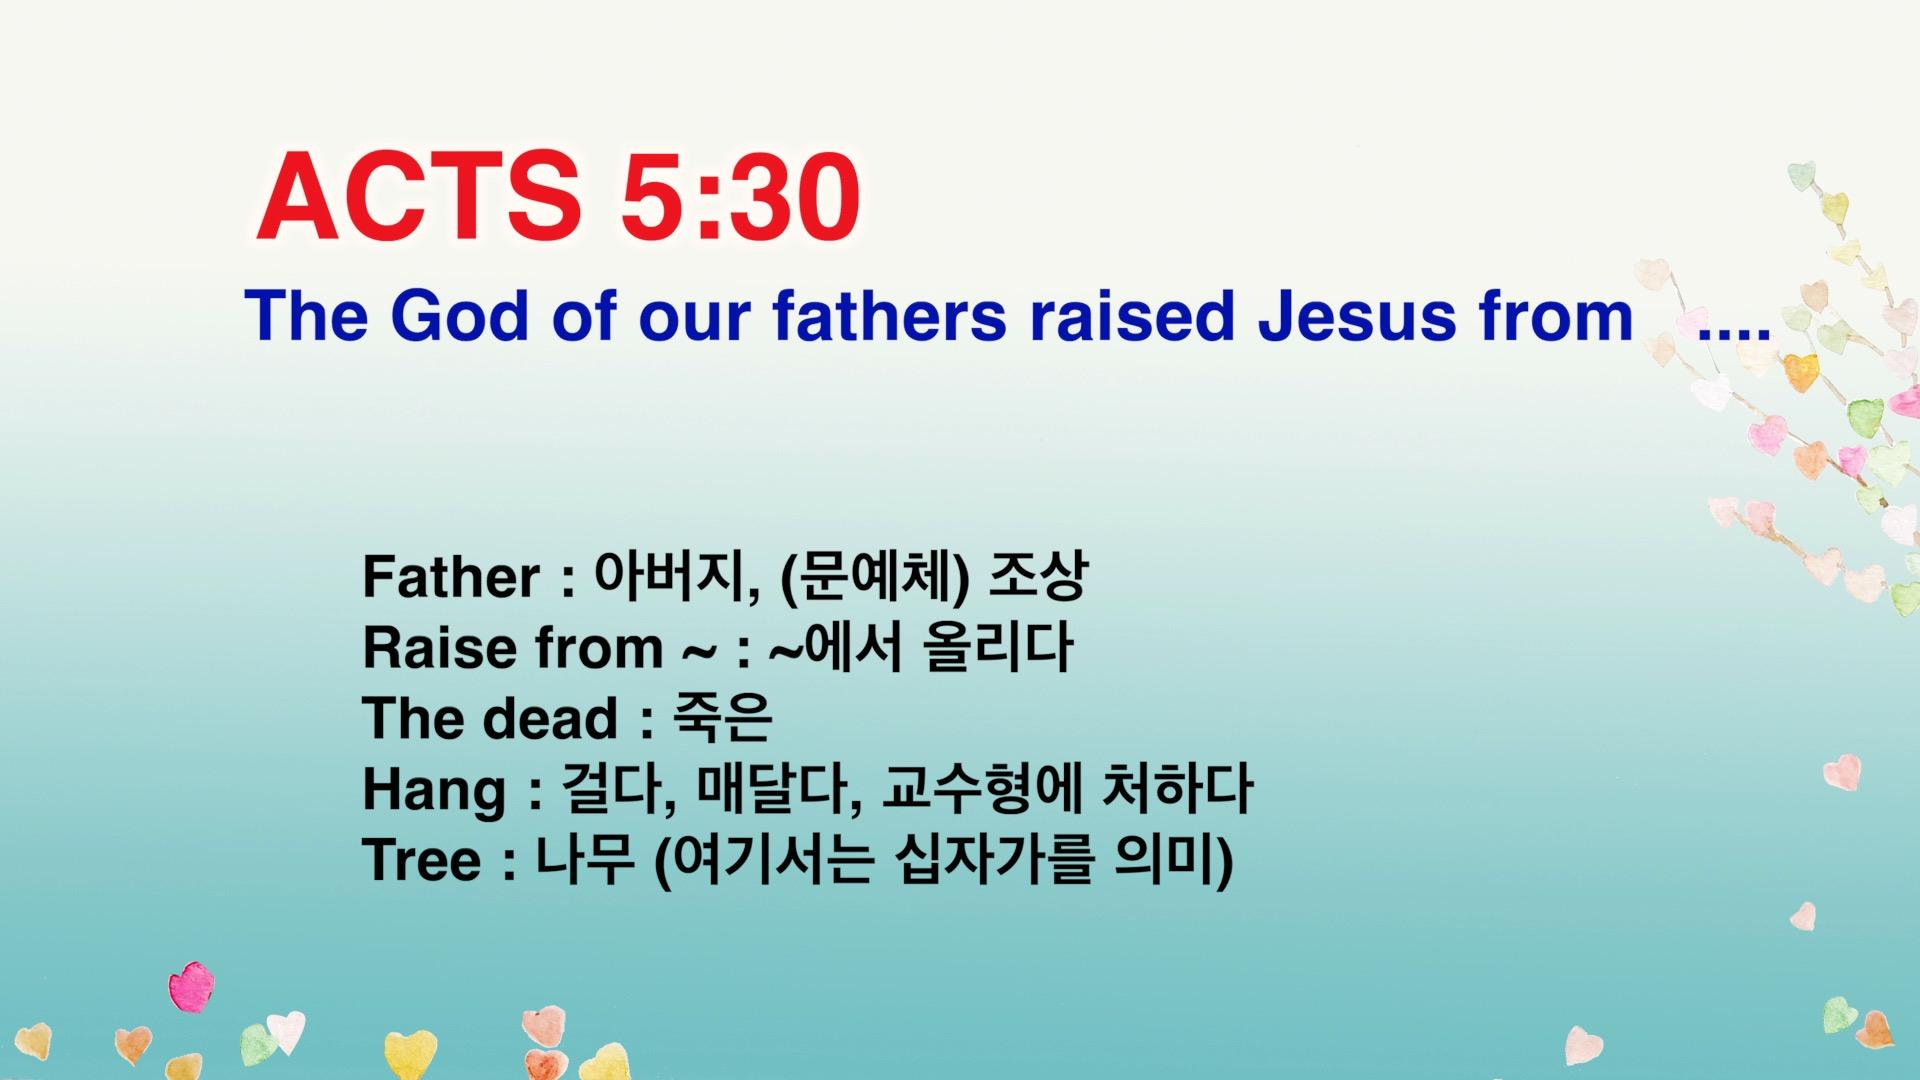 Leena's Bible English-Acts Chap. 5, Ver.30